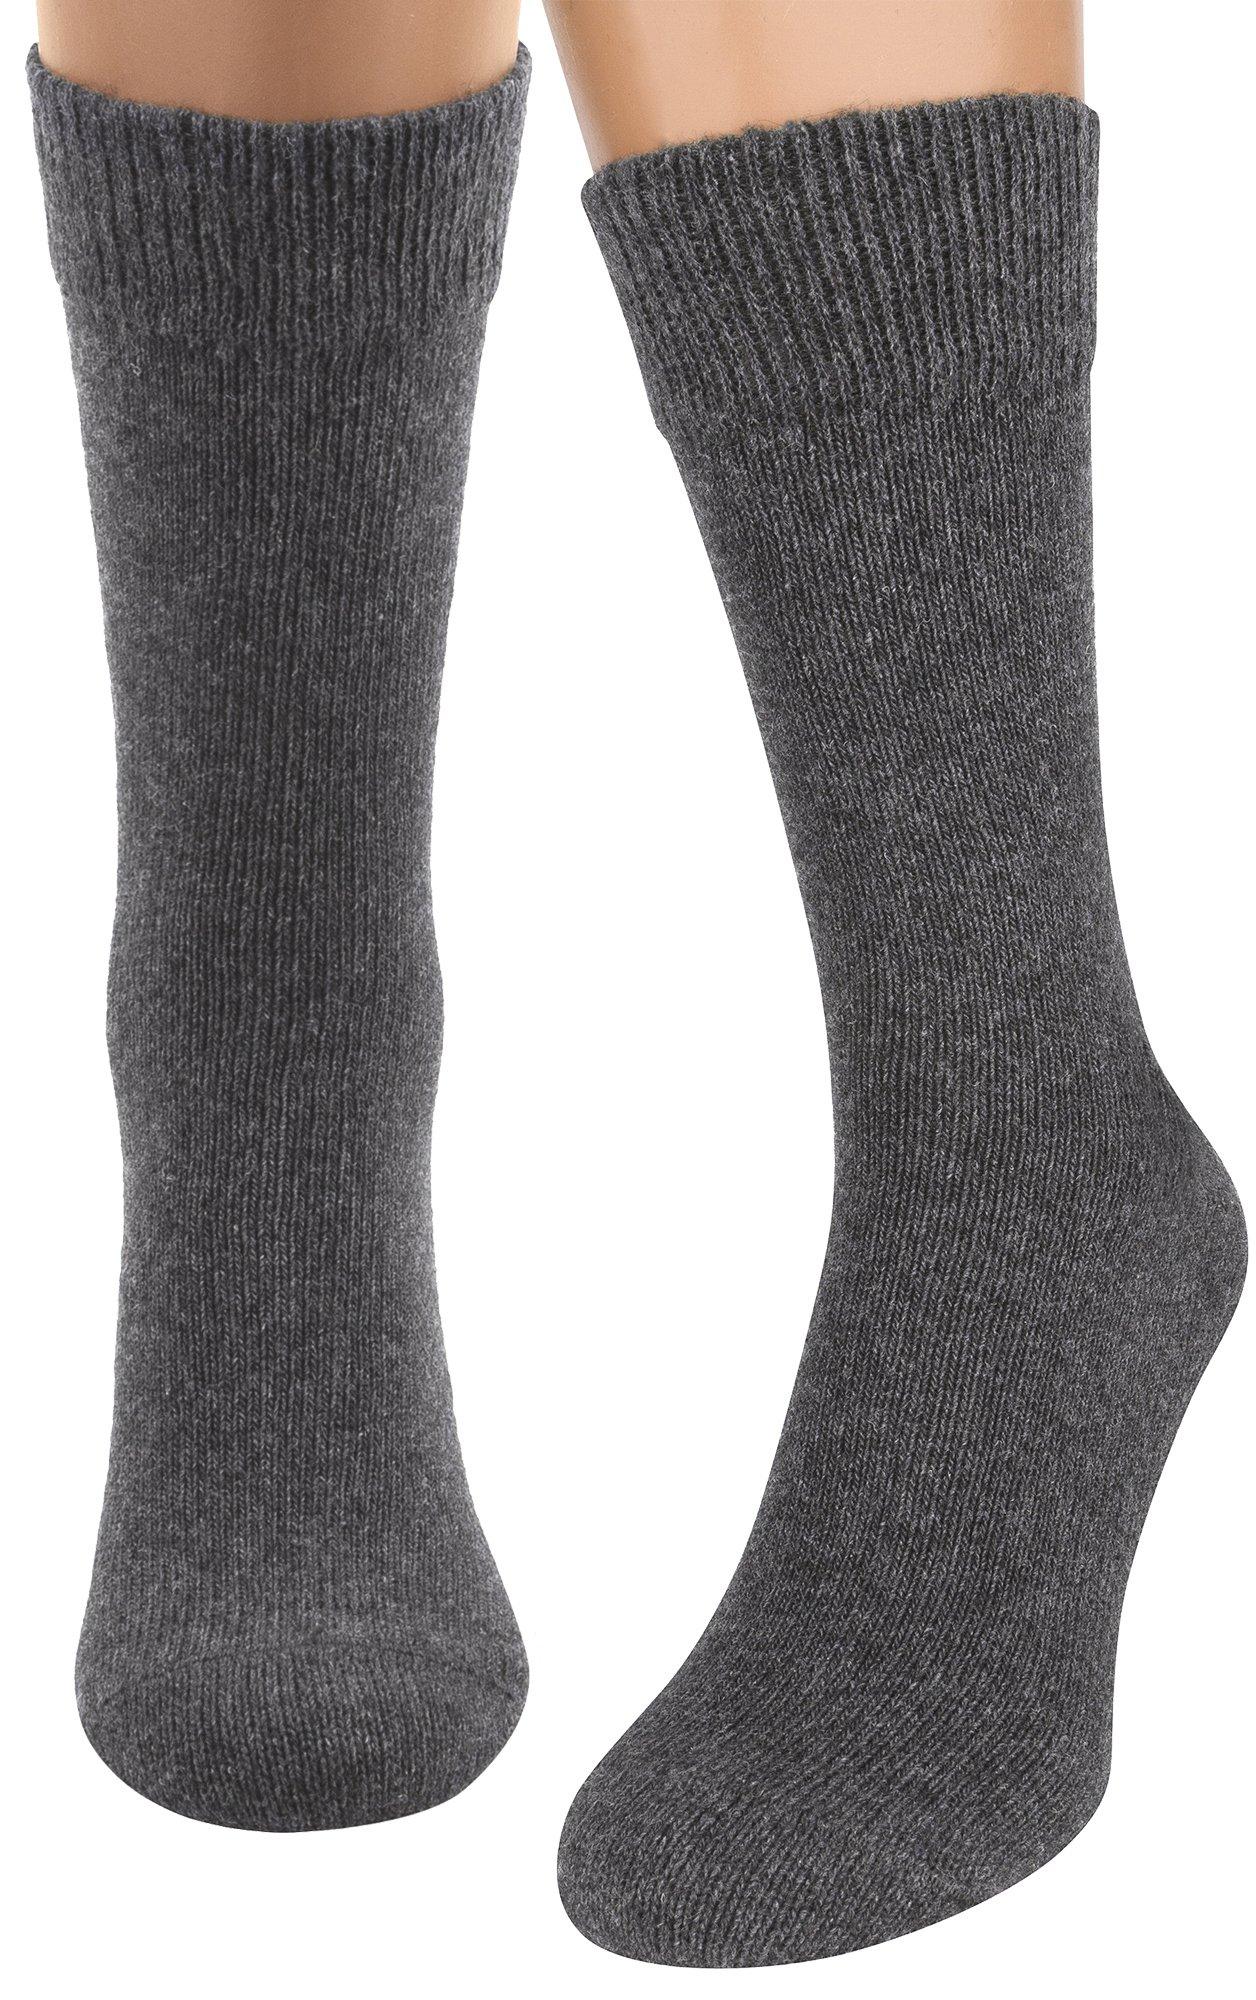 Hiking Trekking Dress Socks, 2 packs Thin Merino Wool Organic Cotton Boot Socks by AIR SOCKS (Grey XL)